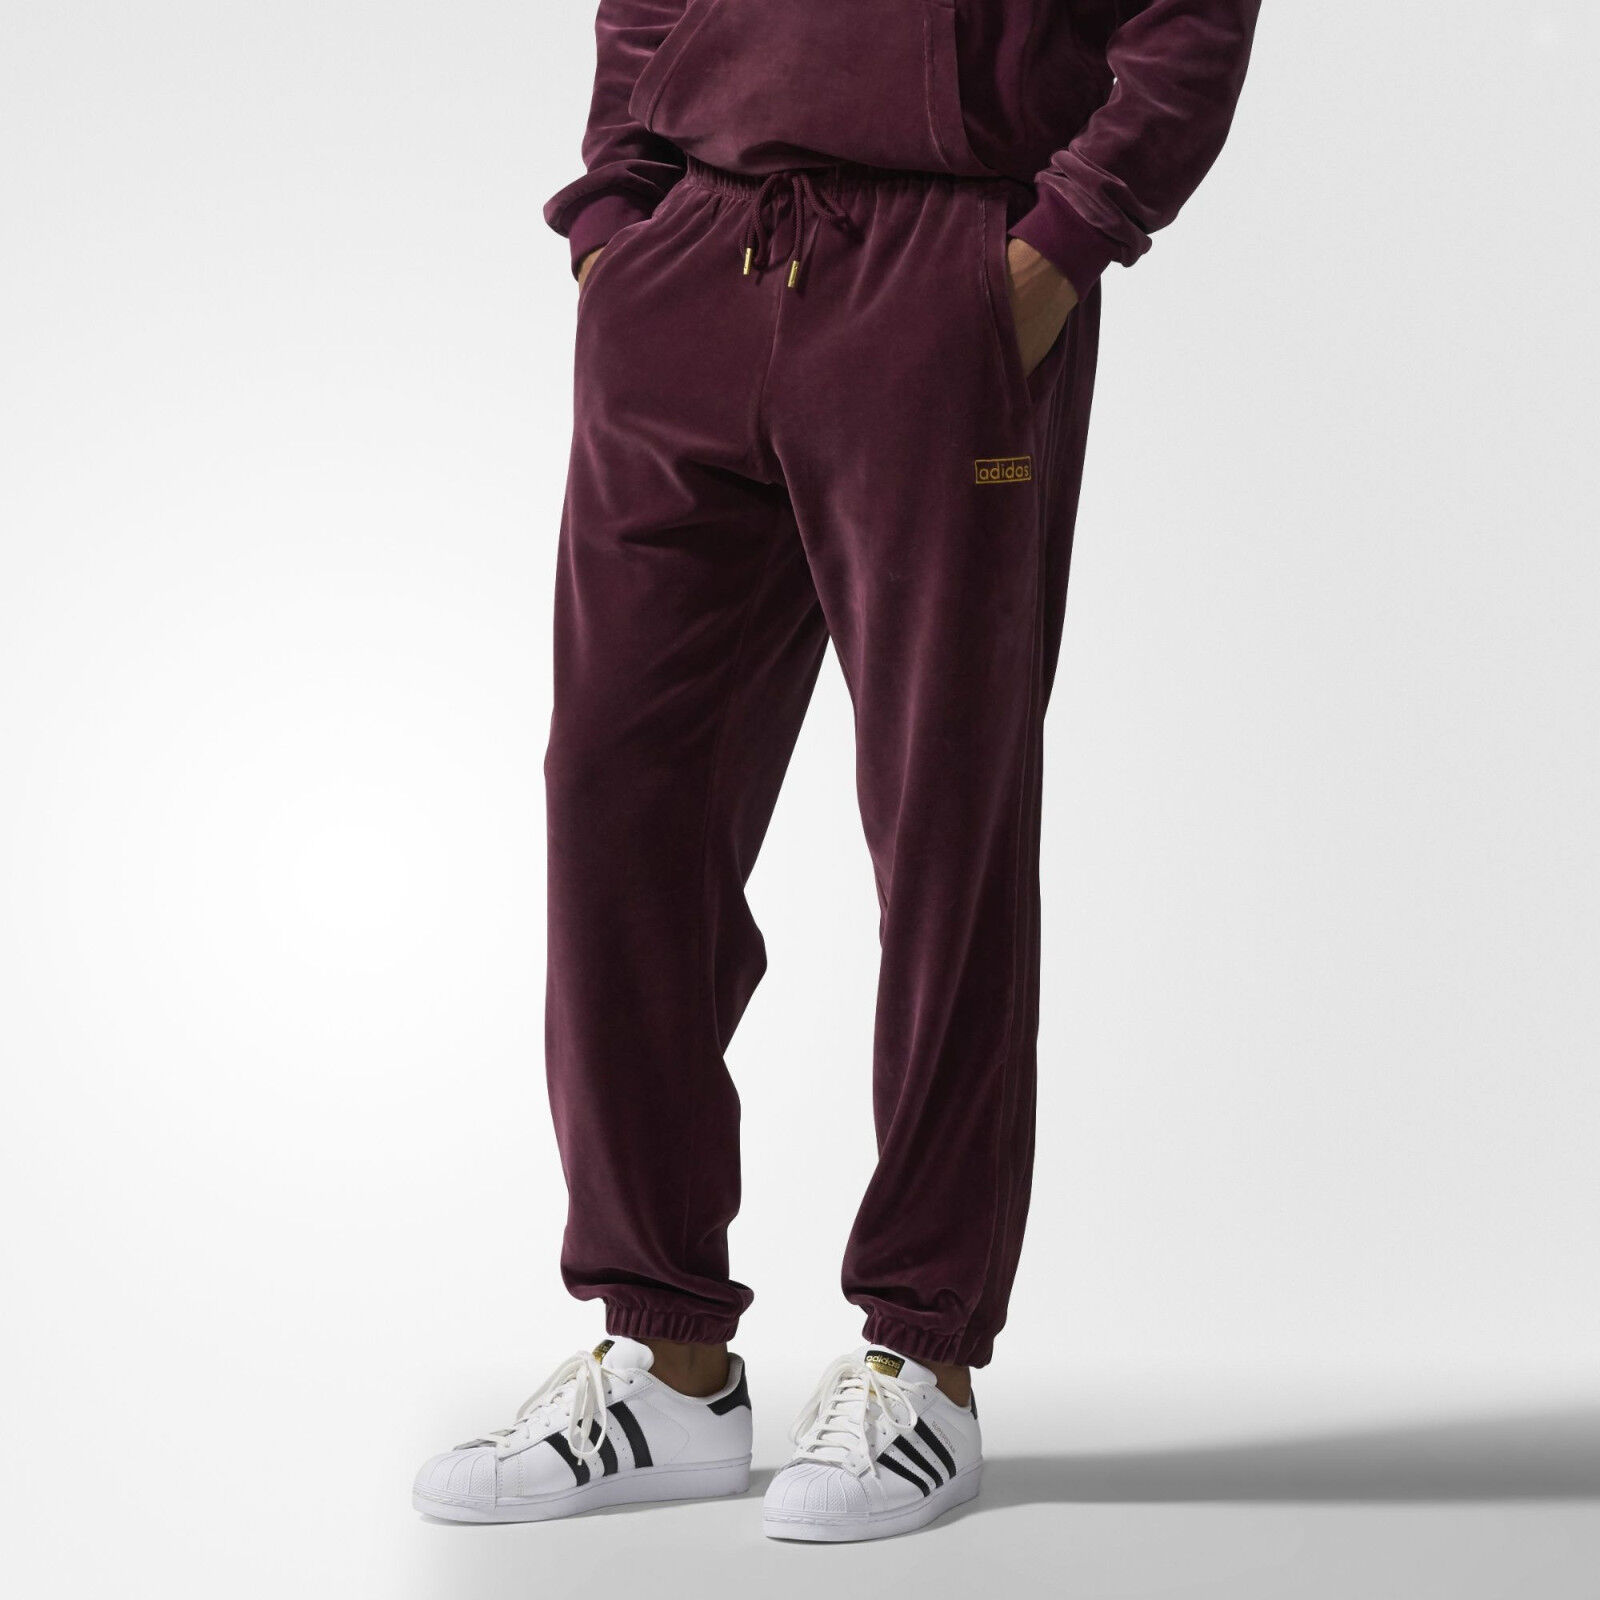 Adidas Originals Velour Sweat Pants Maroon Sizes S to XL AY9231 gold Logo